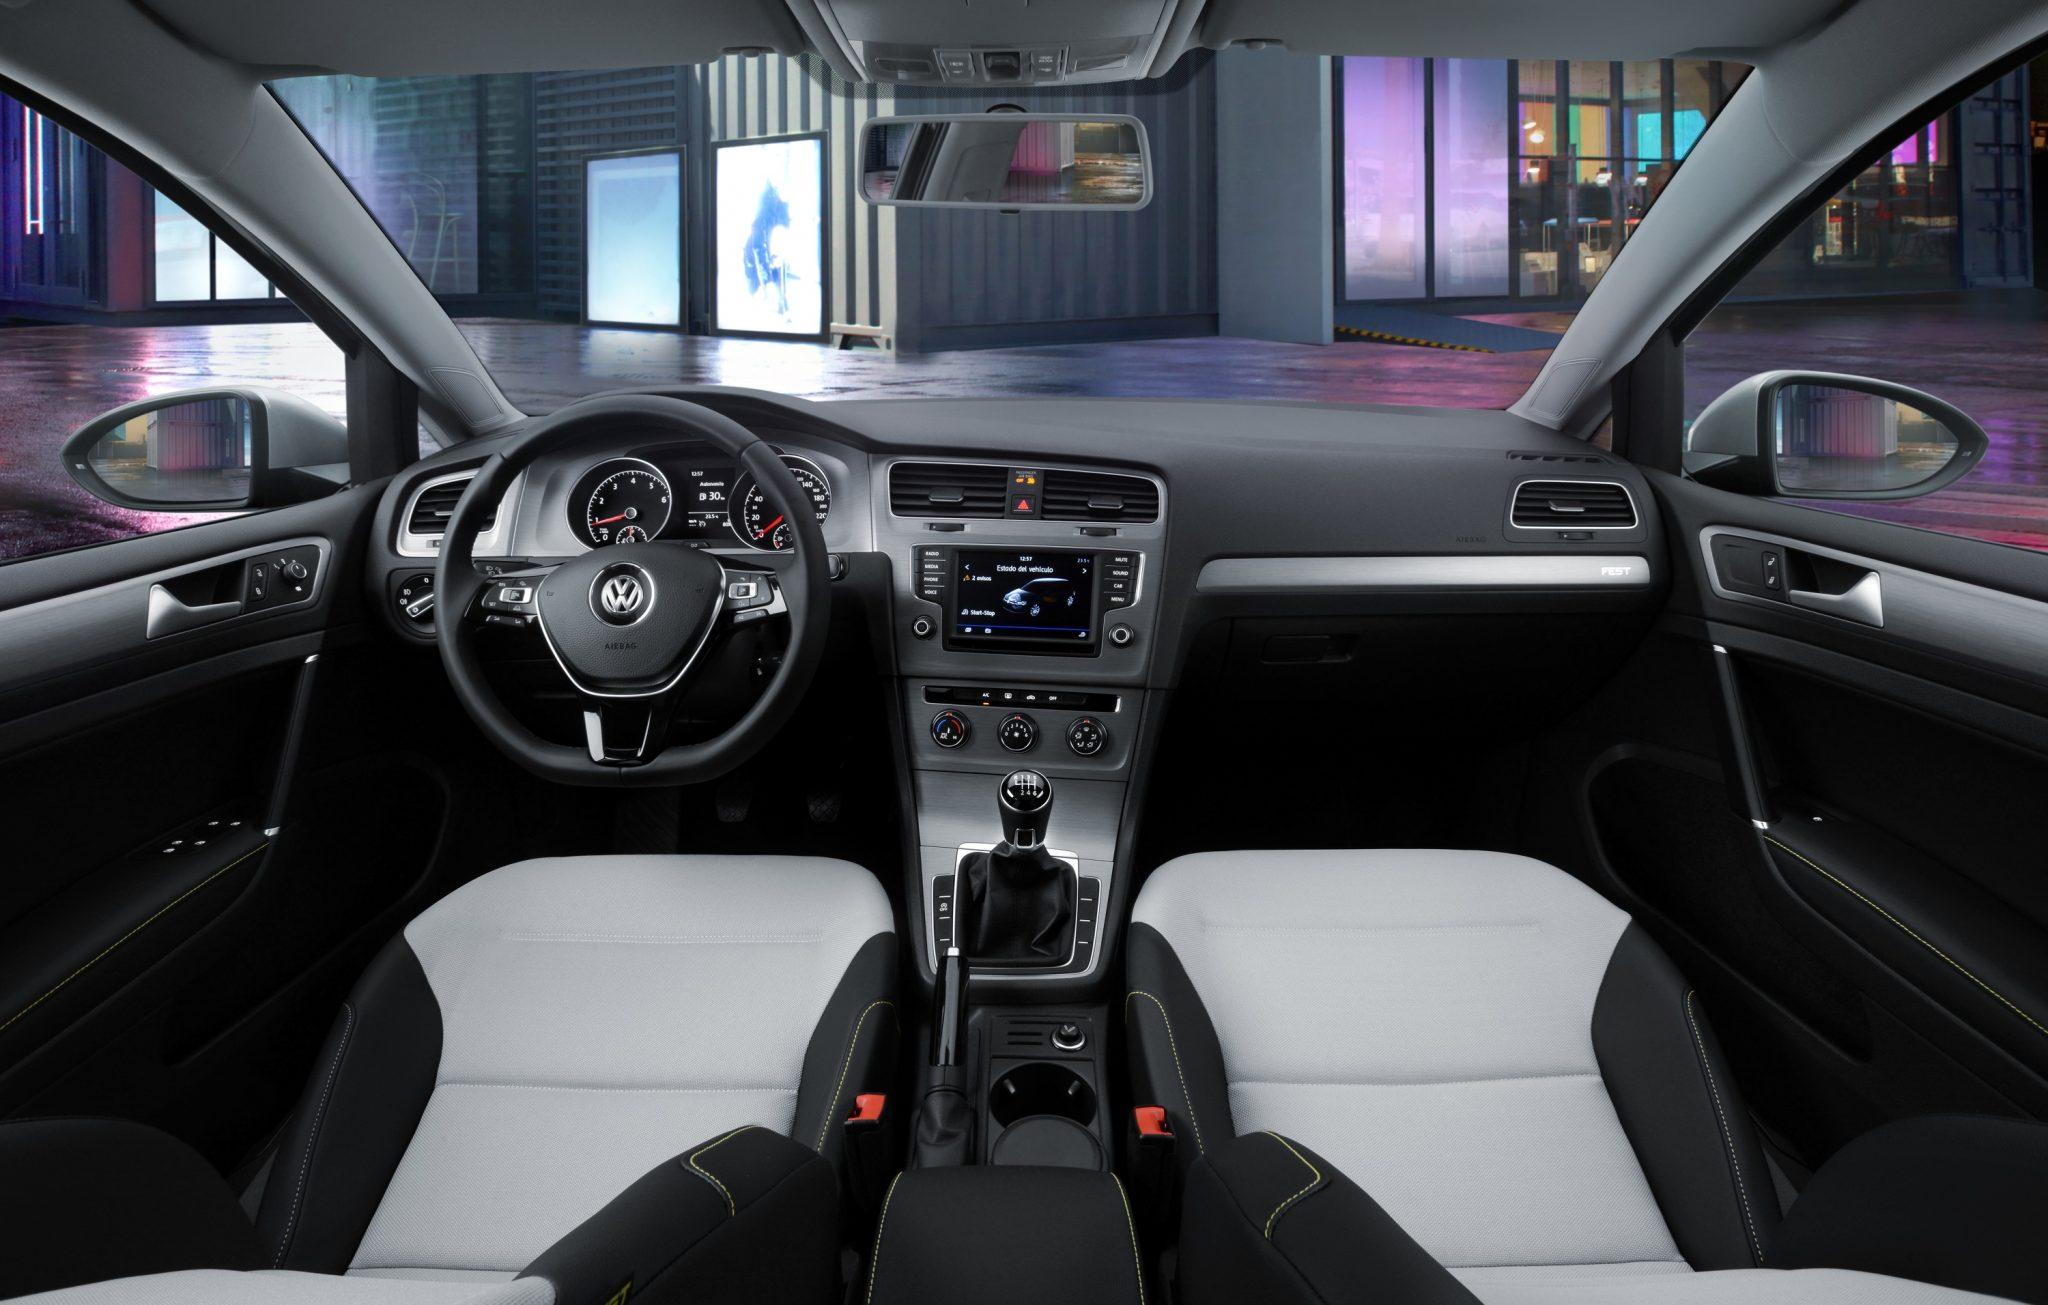 Volkswagen Golf Fest 2017 Llega A M Xico Autos Y Moda M Xico